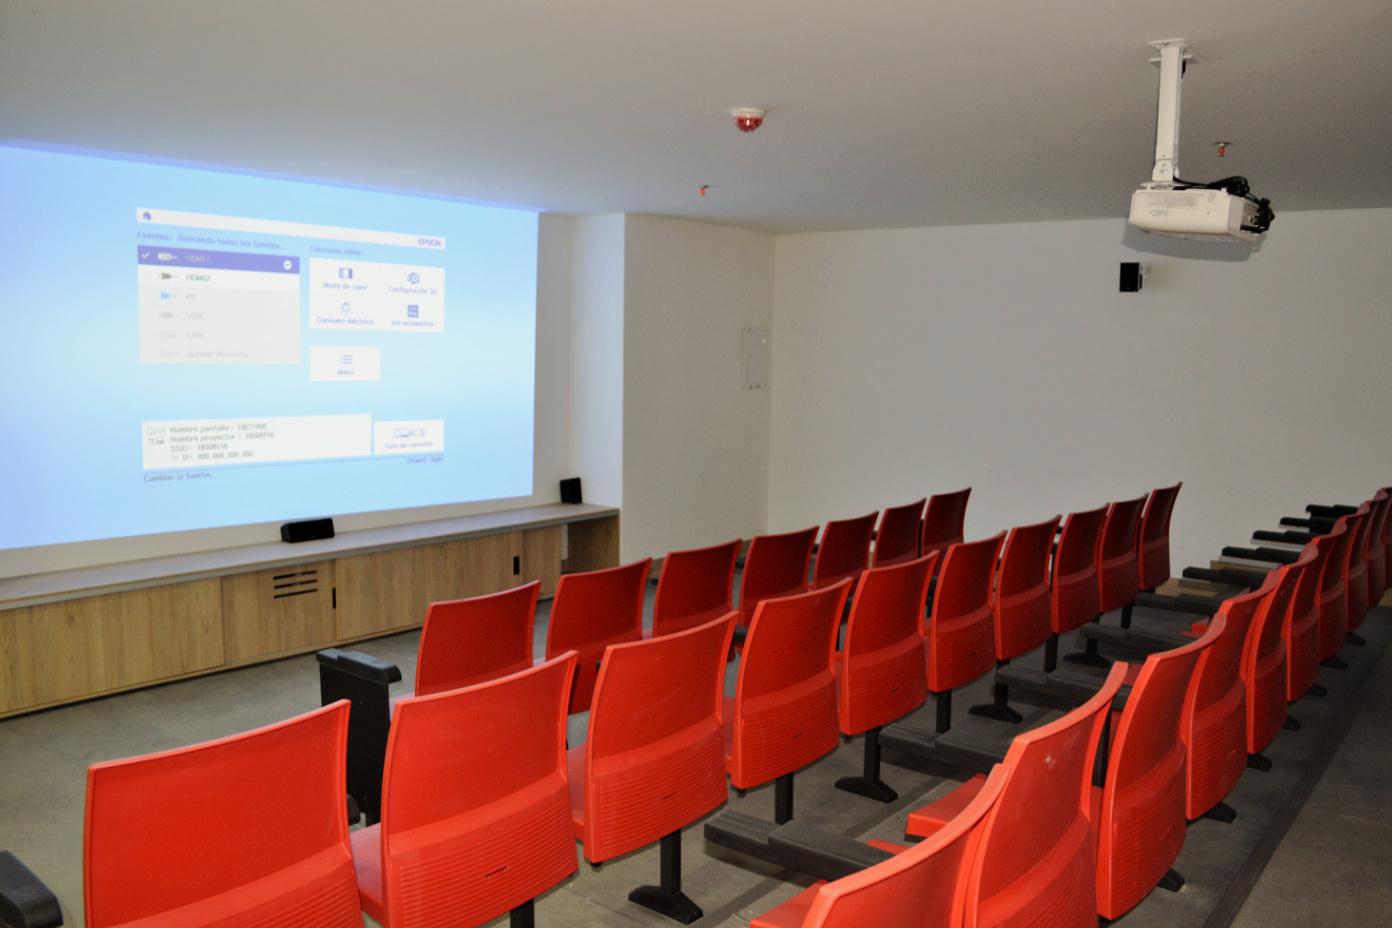 Auditorio Interactivo tipo cine - Club House - Torres de Timiza, apartamentos en venta, sector Kennedy, Bogotá, vivienda de interés social VIS, aplica subsidio